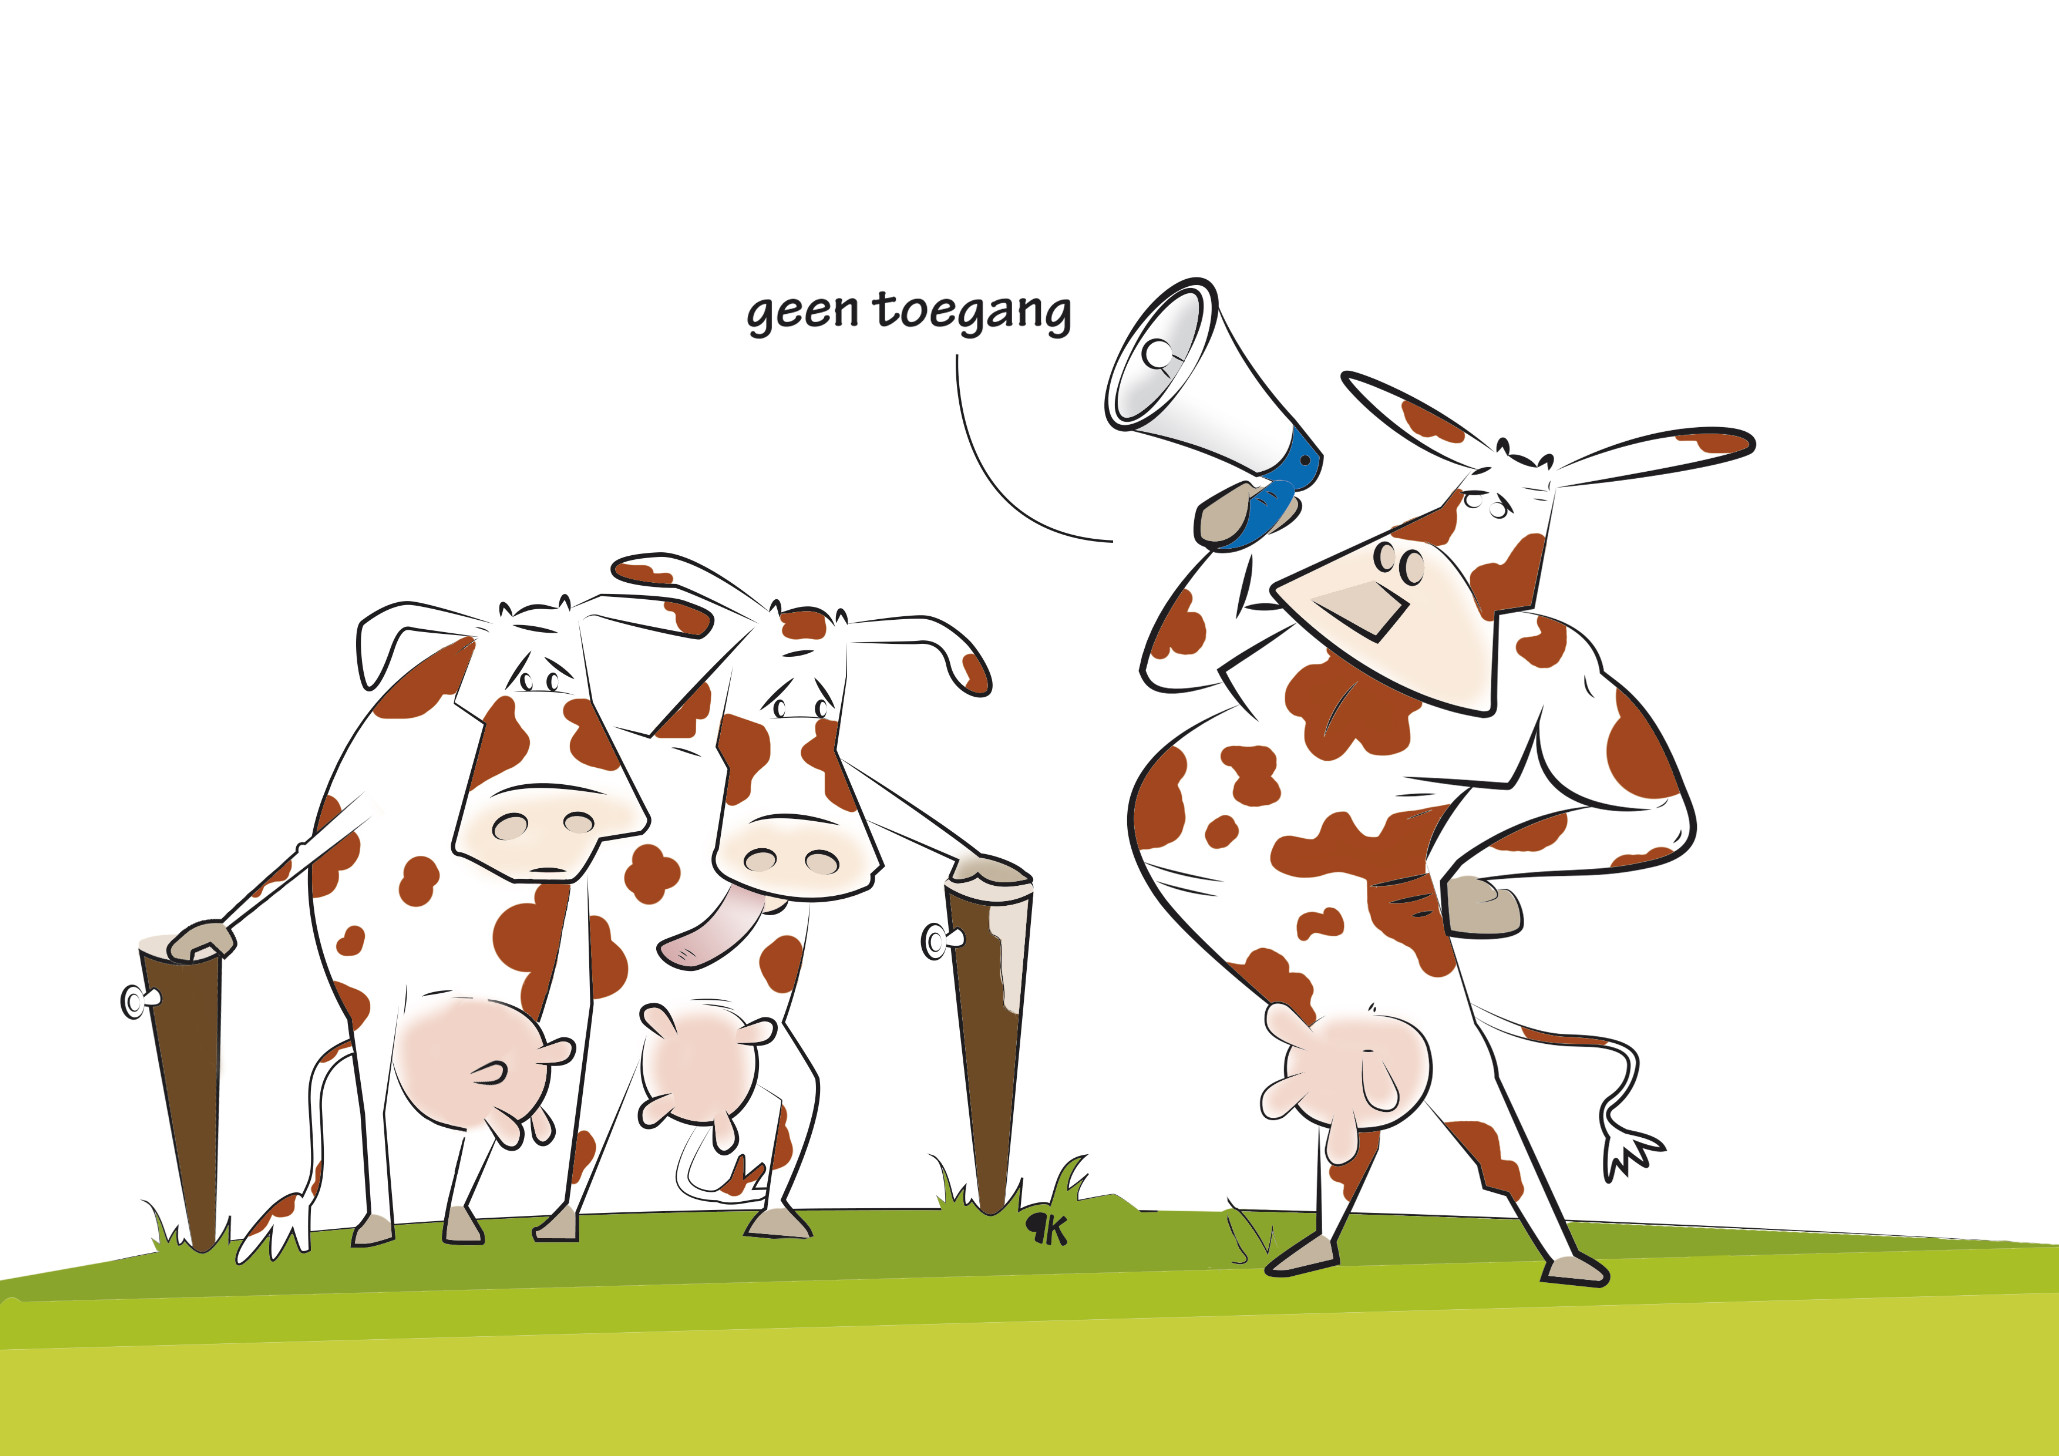 '35 kuub en 20 ton groencompost beter dan 50 kuub mest'